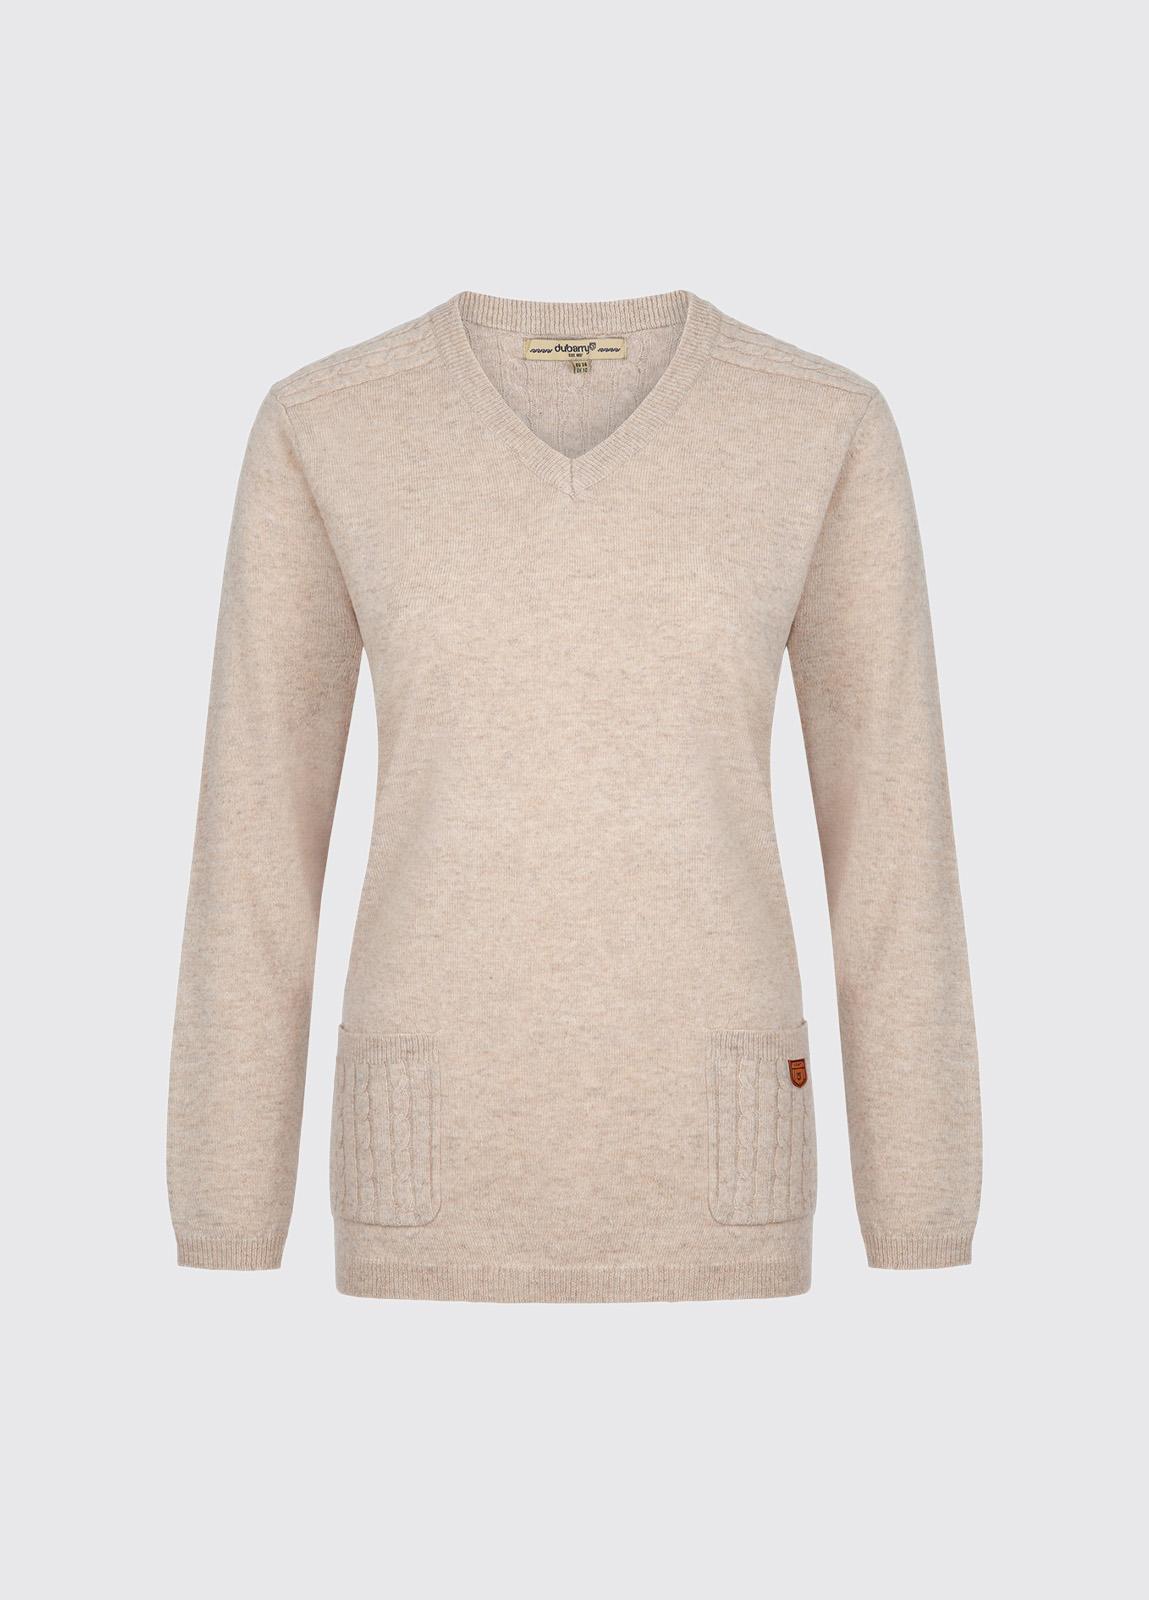 Flaherty Ladies Knitted Lambswool Jumper - Oatmeal